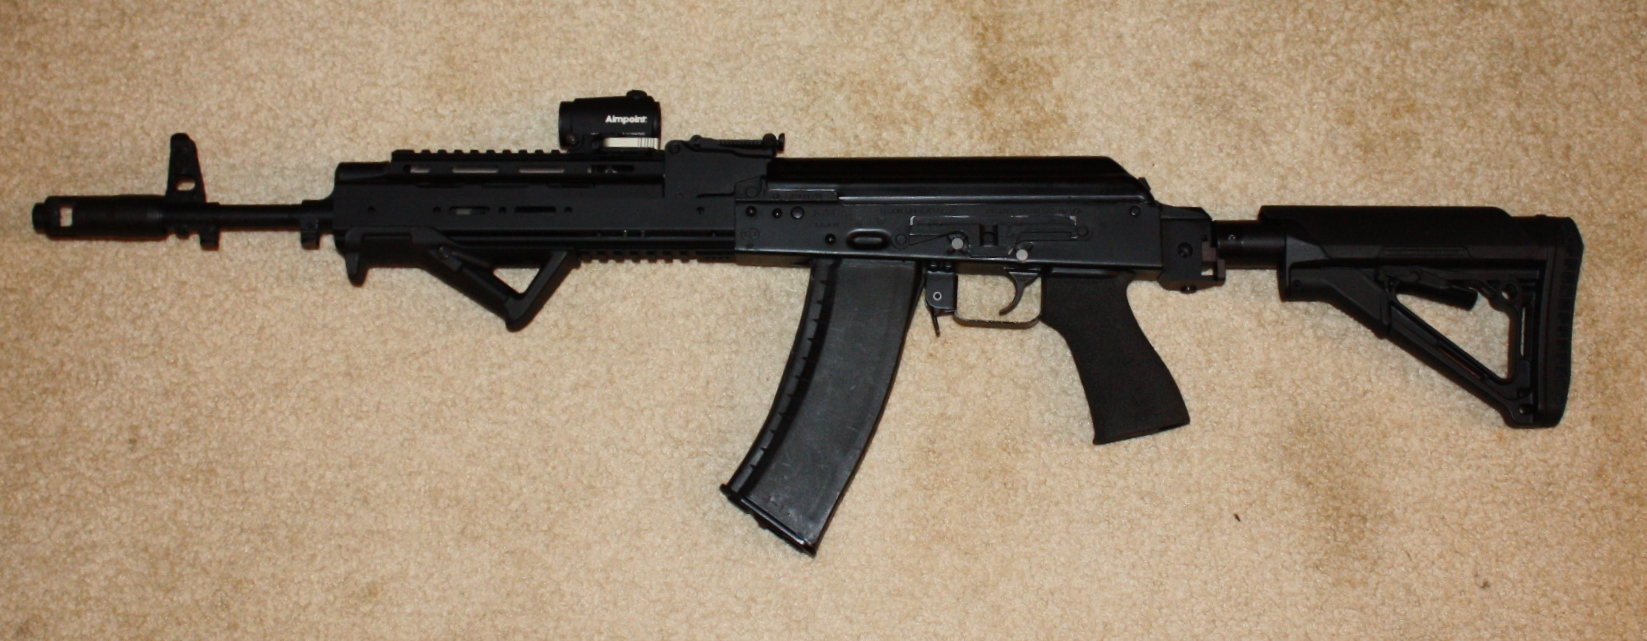 Texas Weapons Systems Kalashnikov Handguard Review – A Blog